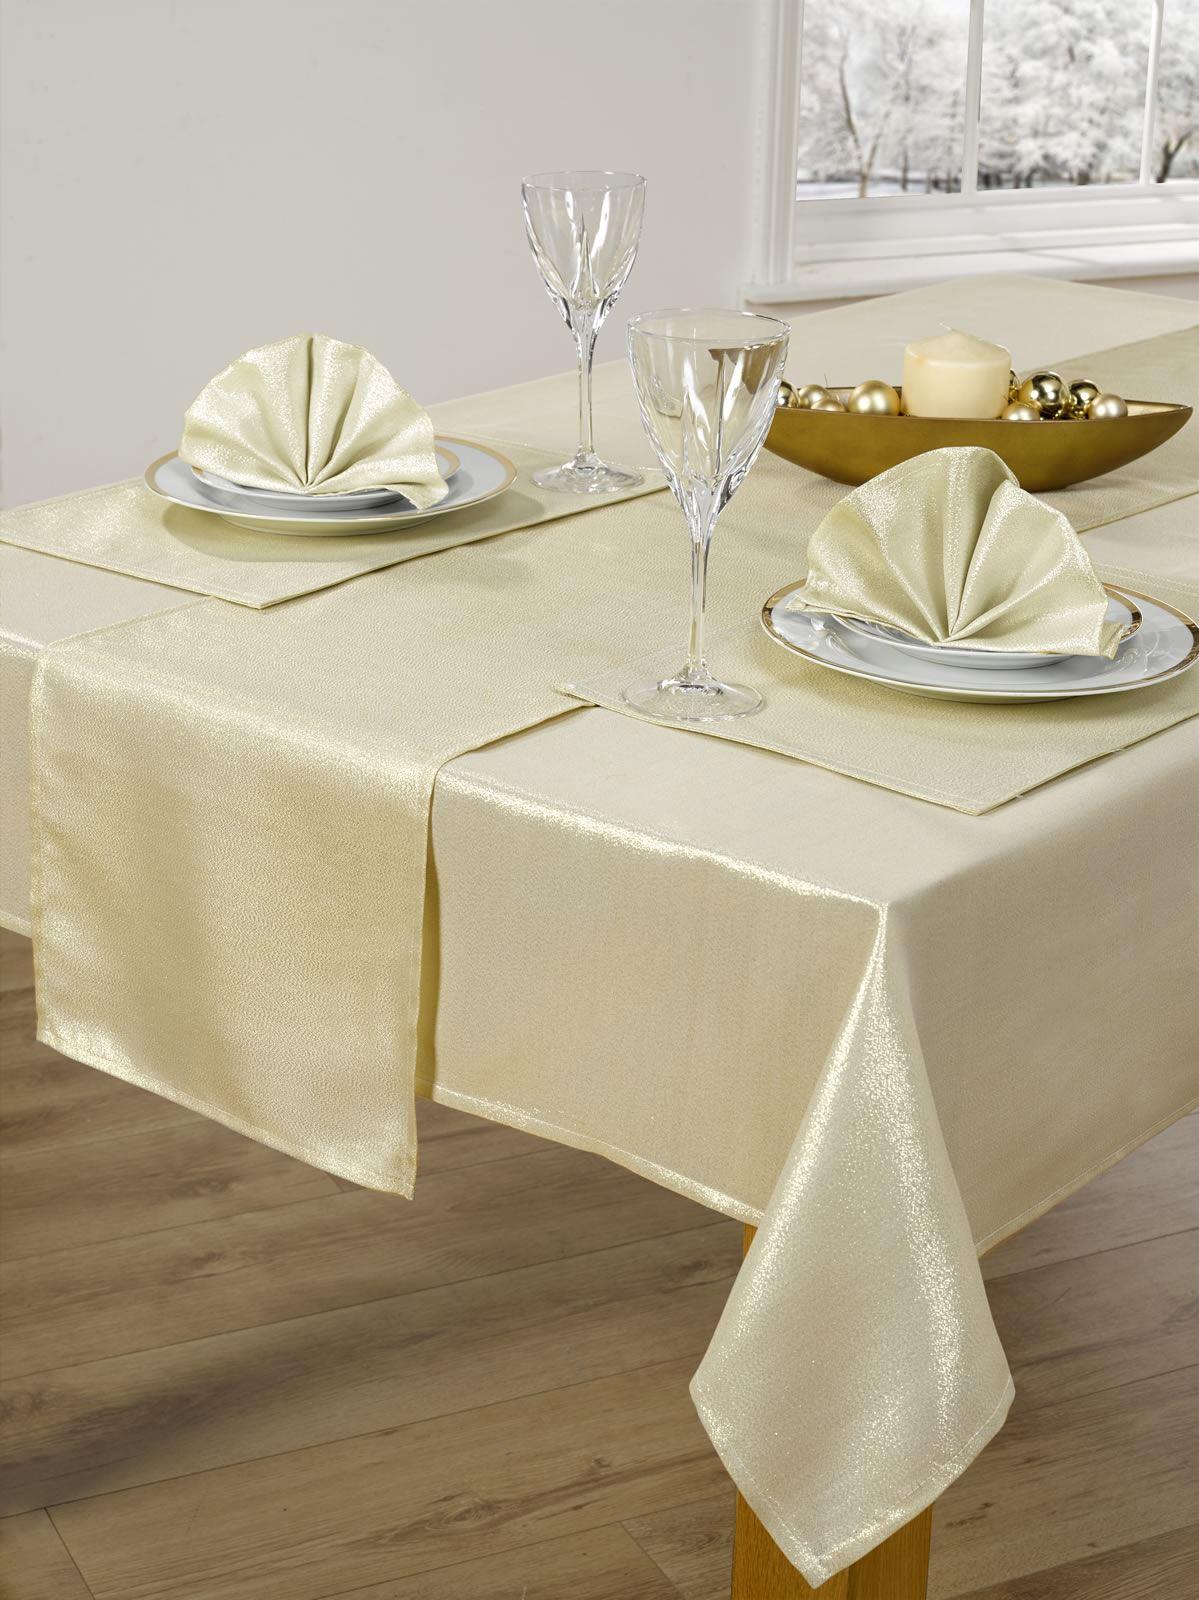 14 Piece Christmas Table Cloth Linen Set Napkins Runner